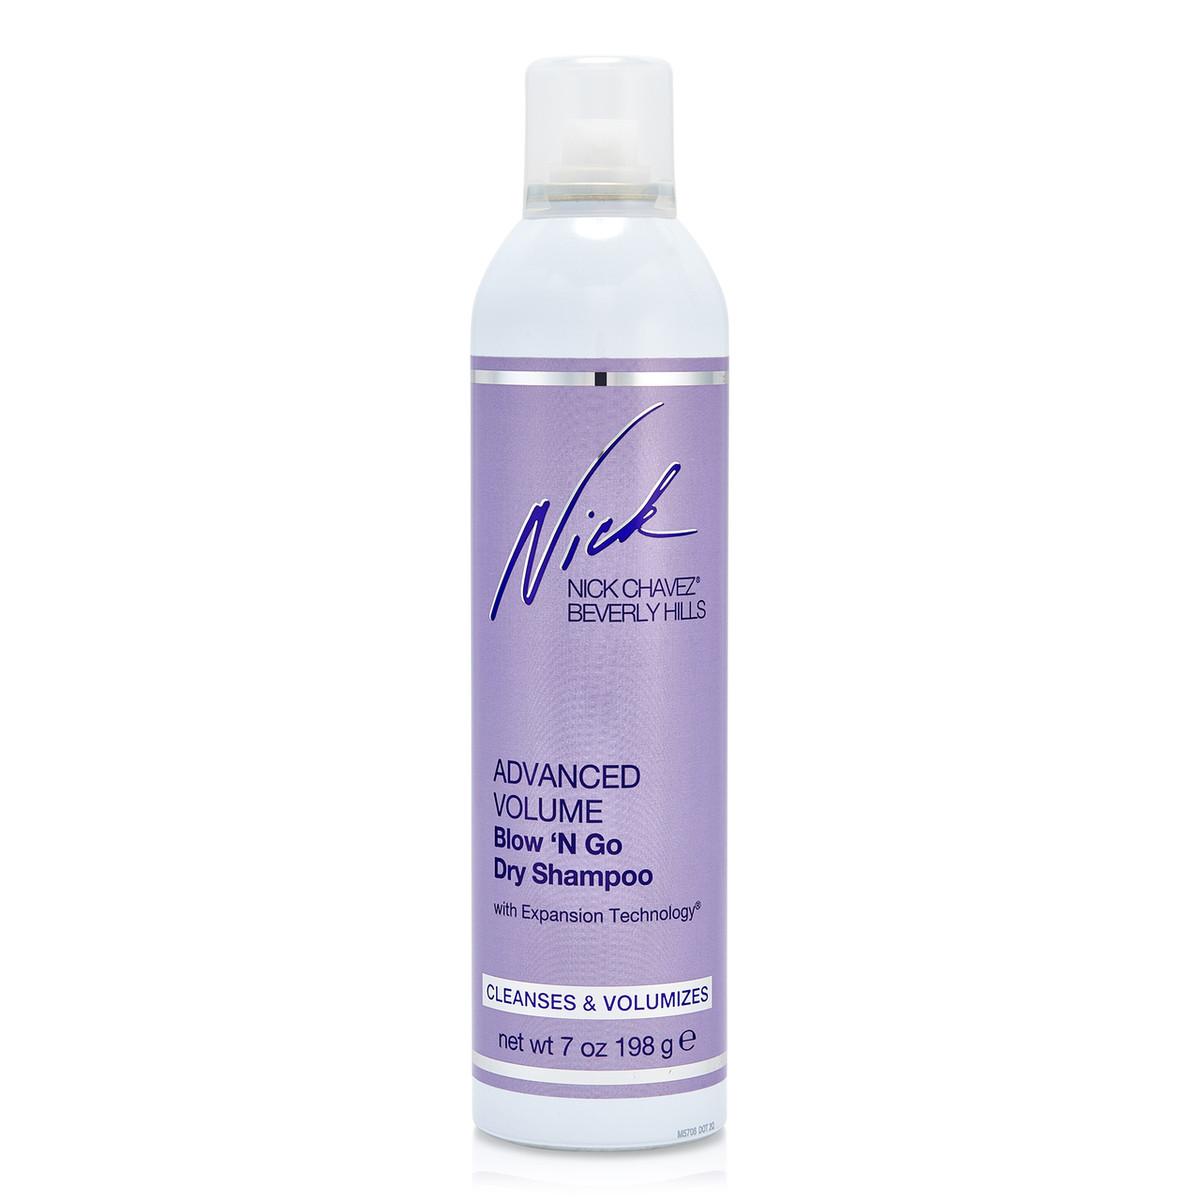 7oz Advanced Volume Blow 'N Go Dry Shampoo